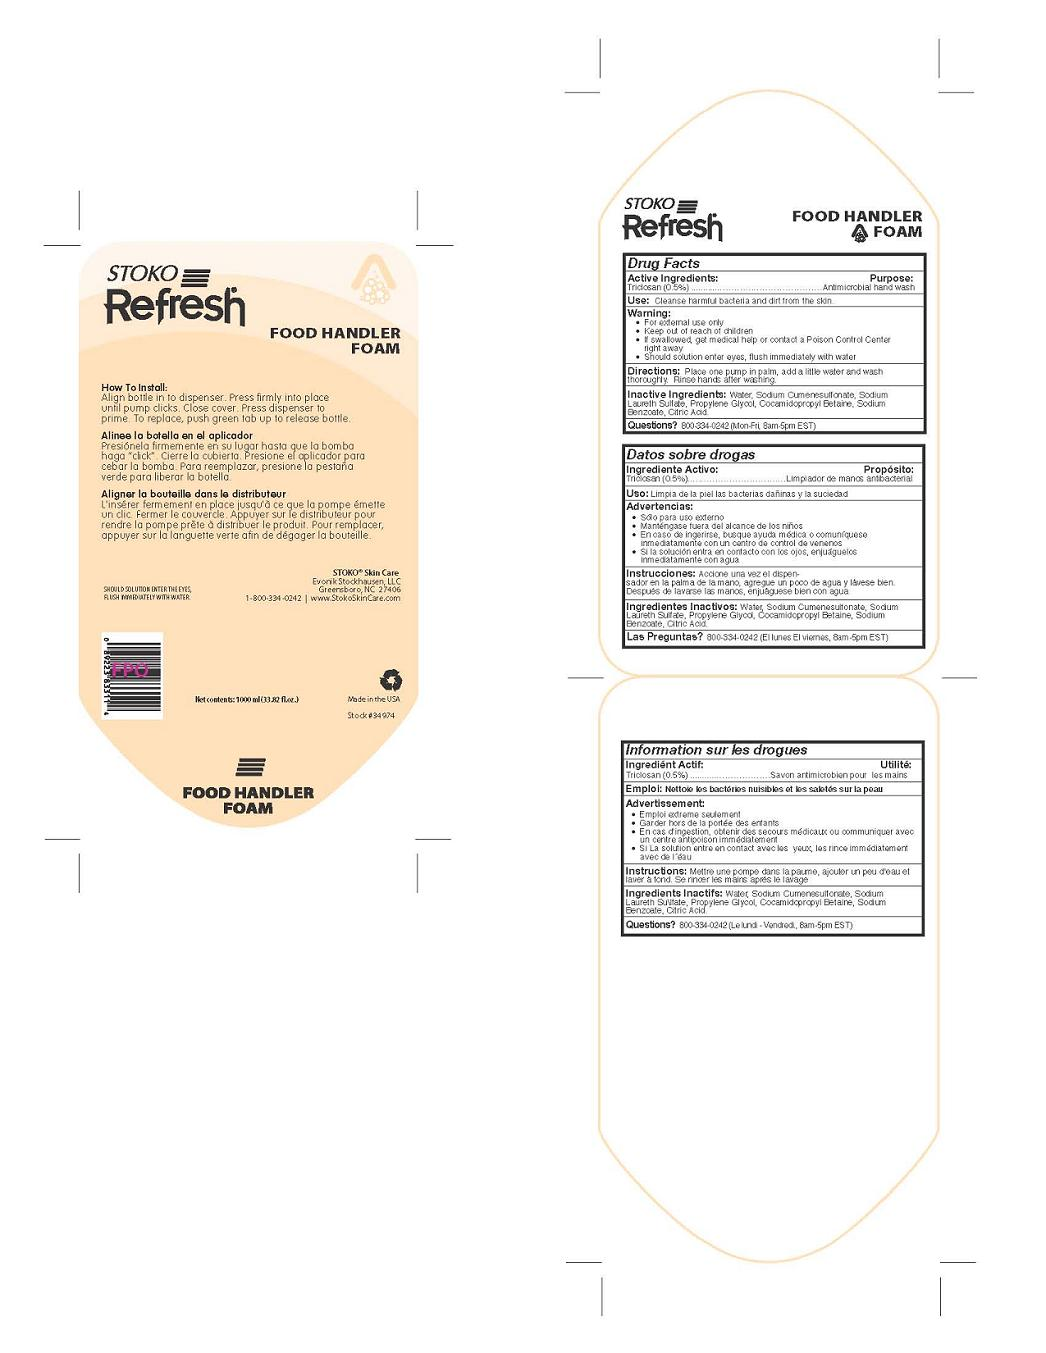 Stoko Refresh Food Handler Foam (Triclosan) Liquid [Evonik Stockhausen, Llc]